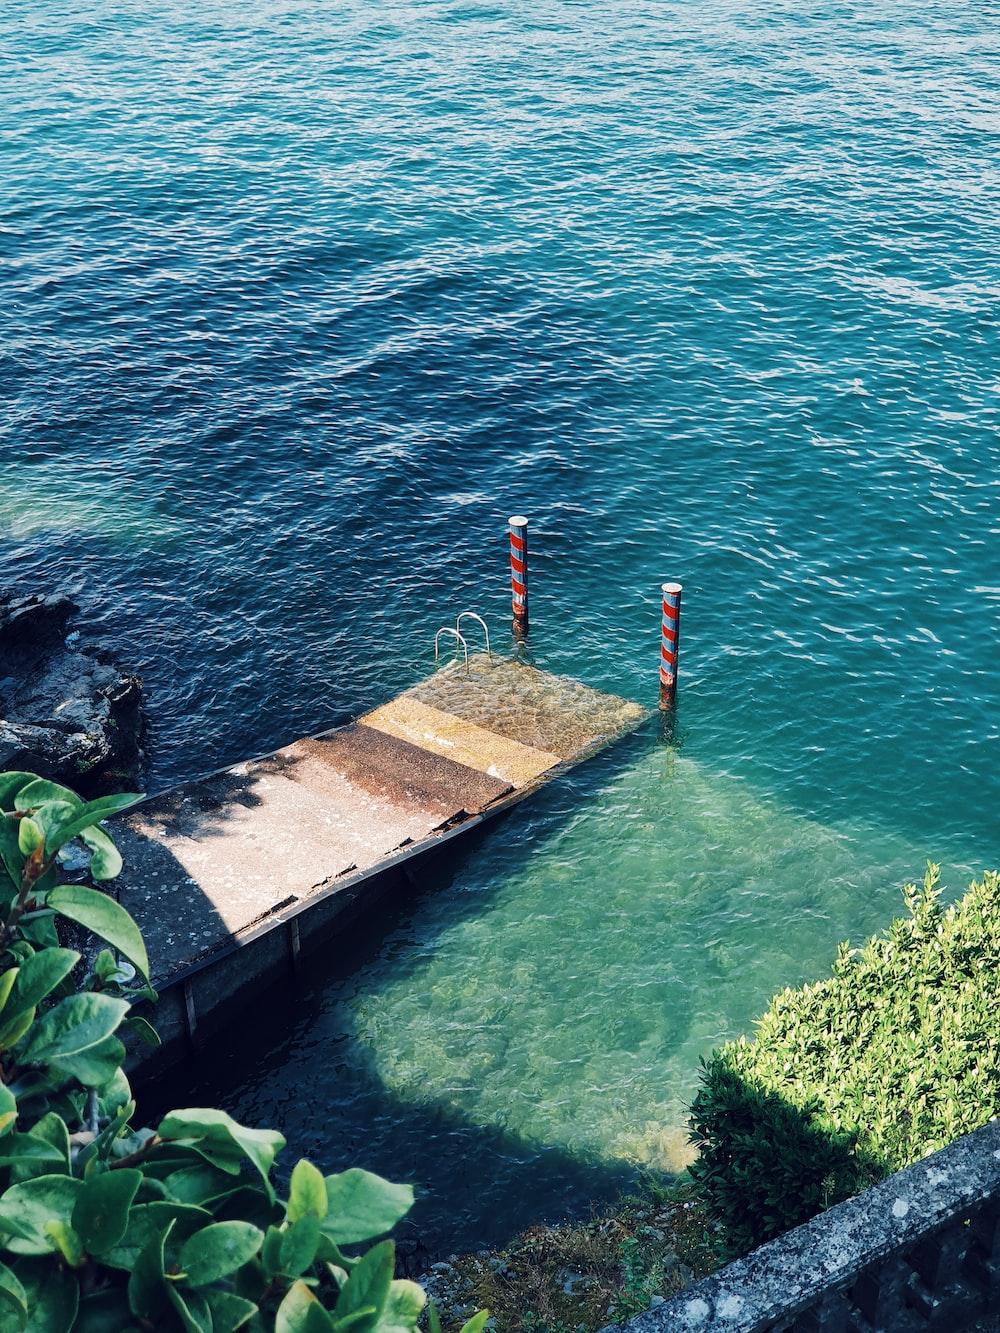 brown concrete dock